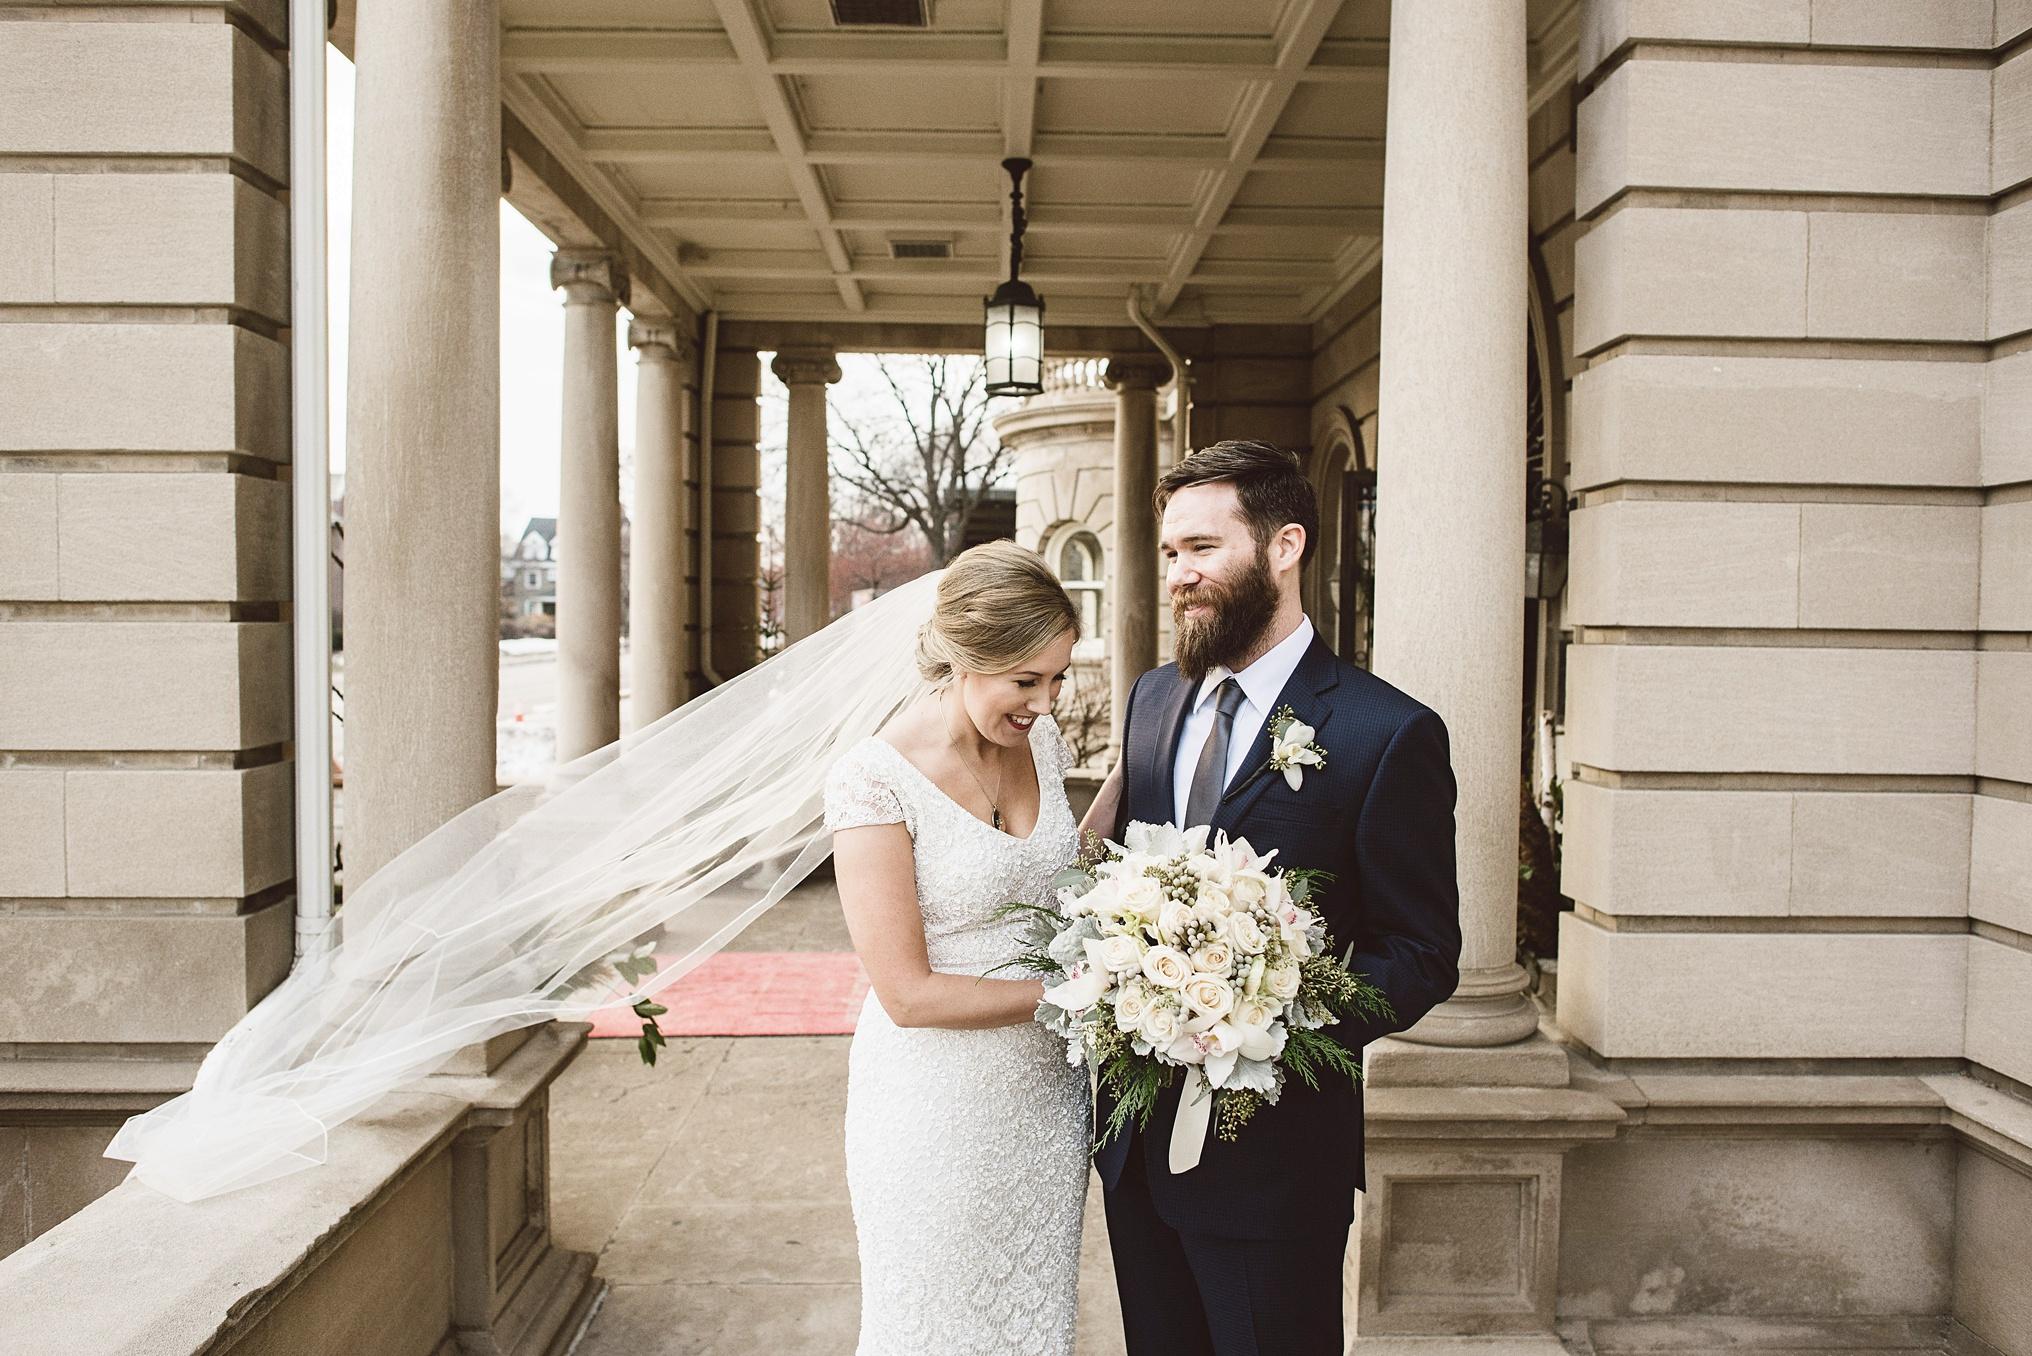 best_wedding_photography_2017_by_lucas_botz_photography_110.jpg